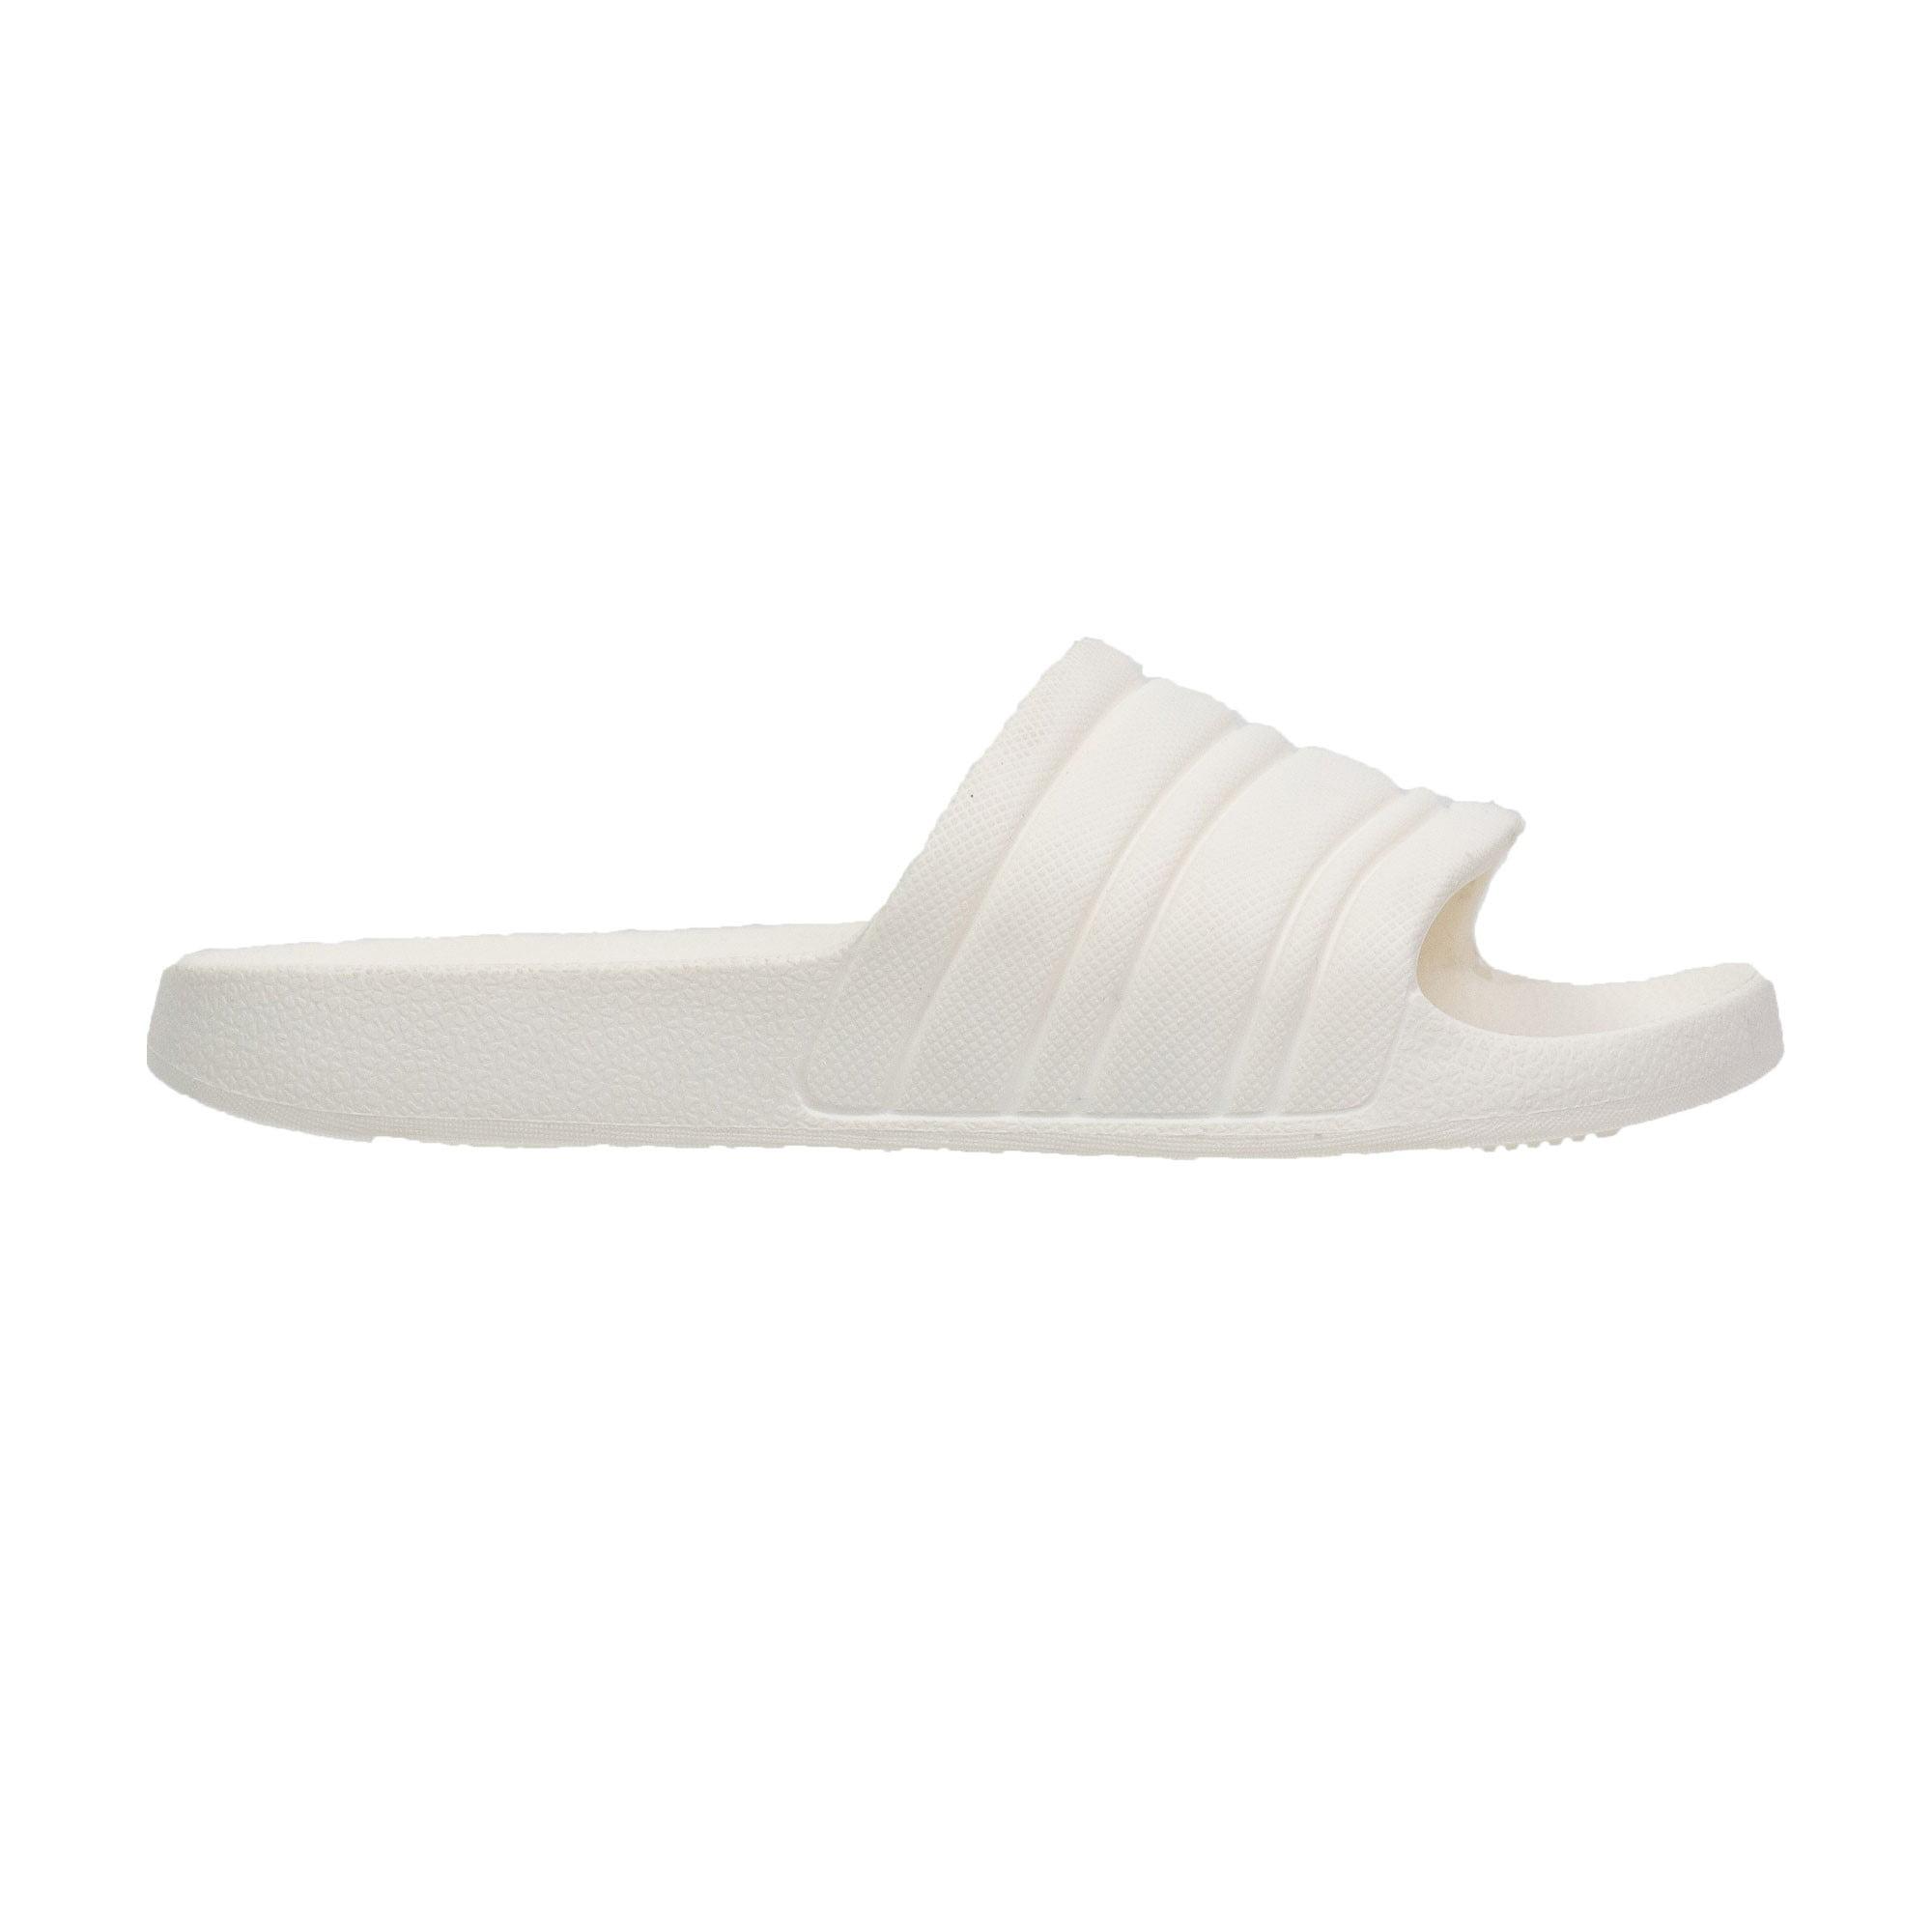 Mia Women's Slide Sandals - Walmart.com